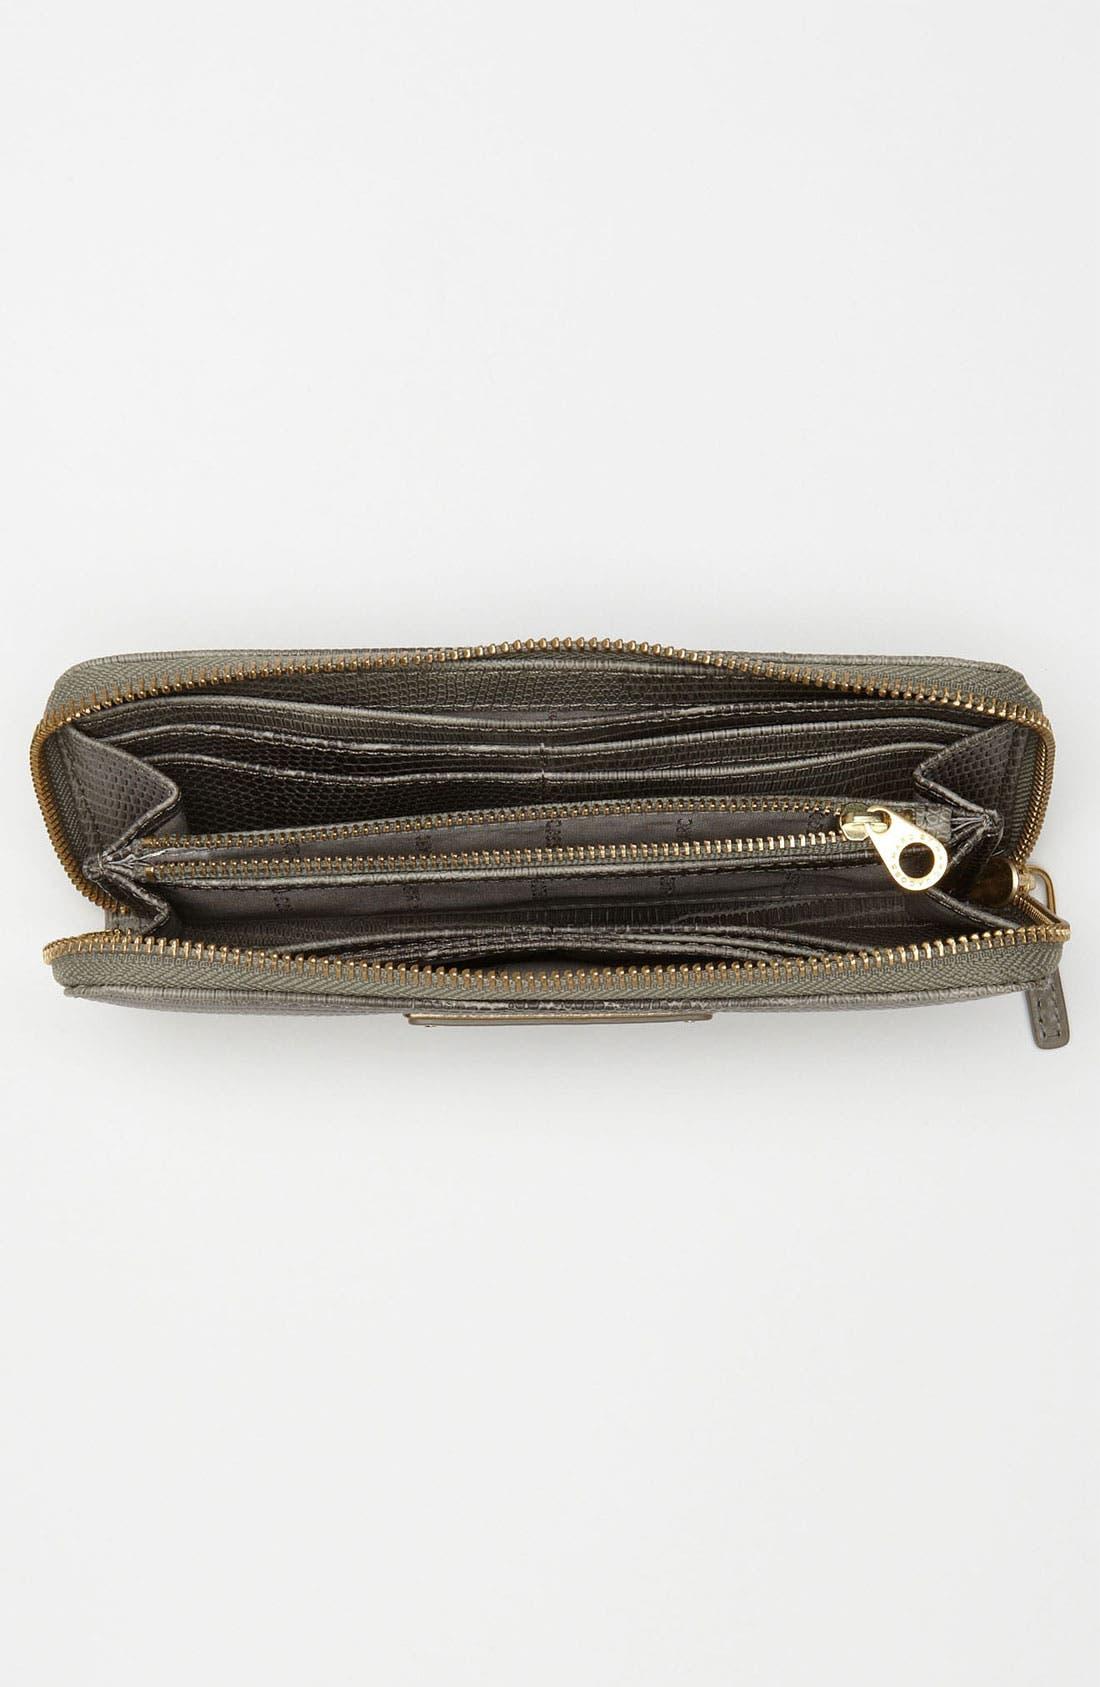 Alternate Image 3  - MARC BY MARC JACOBS 'Take Me' Lizard Embossed Zip Around Wallet